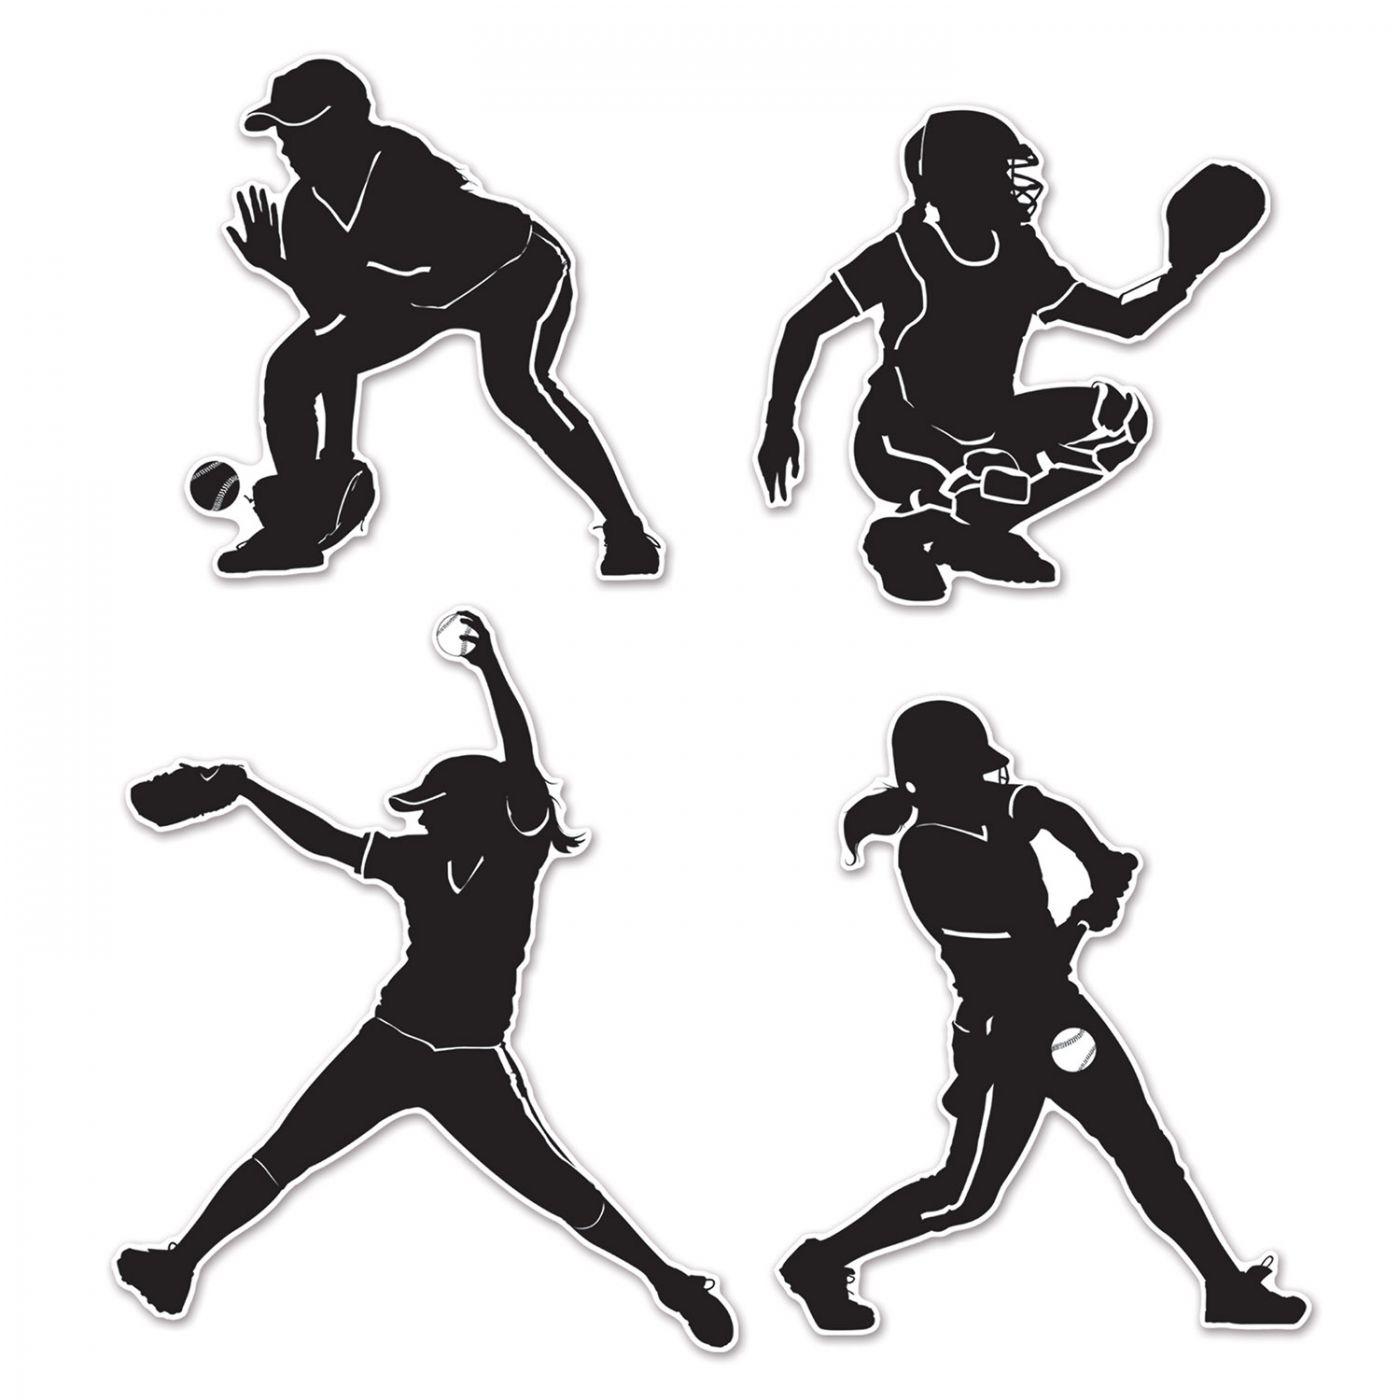 Softball Silhouettes image